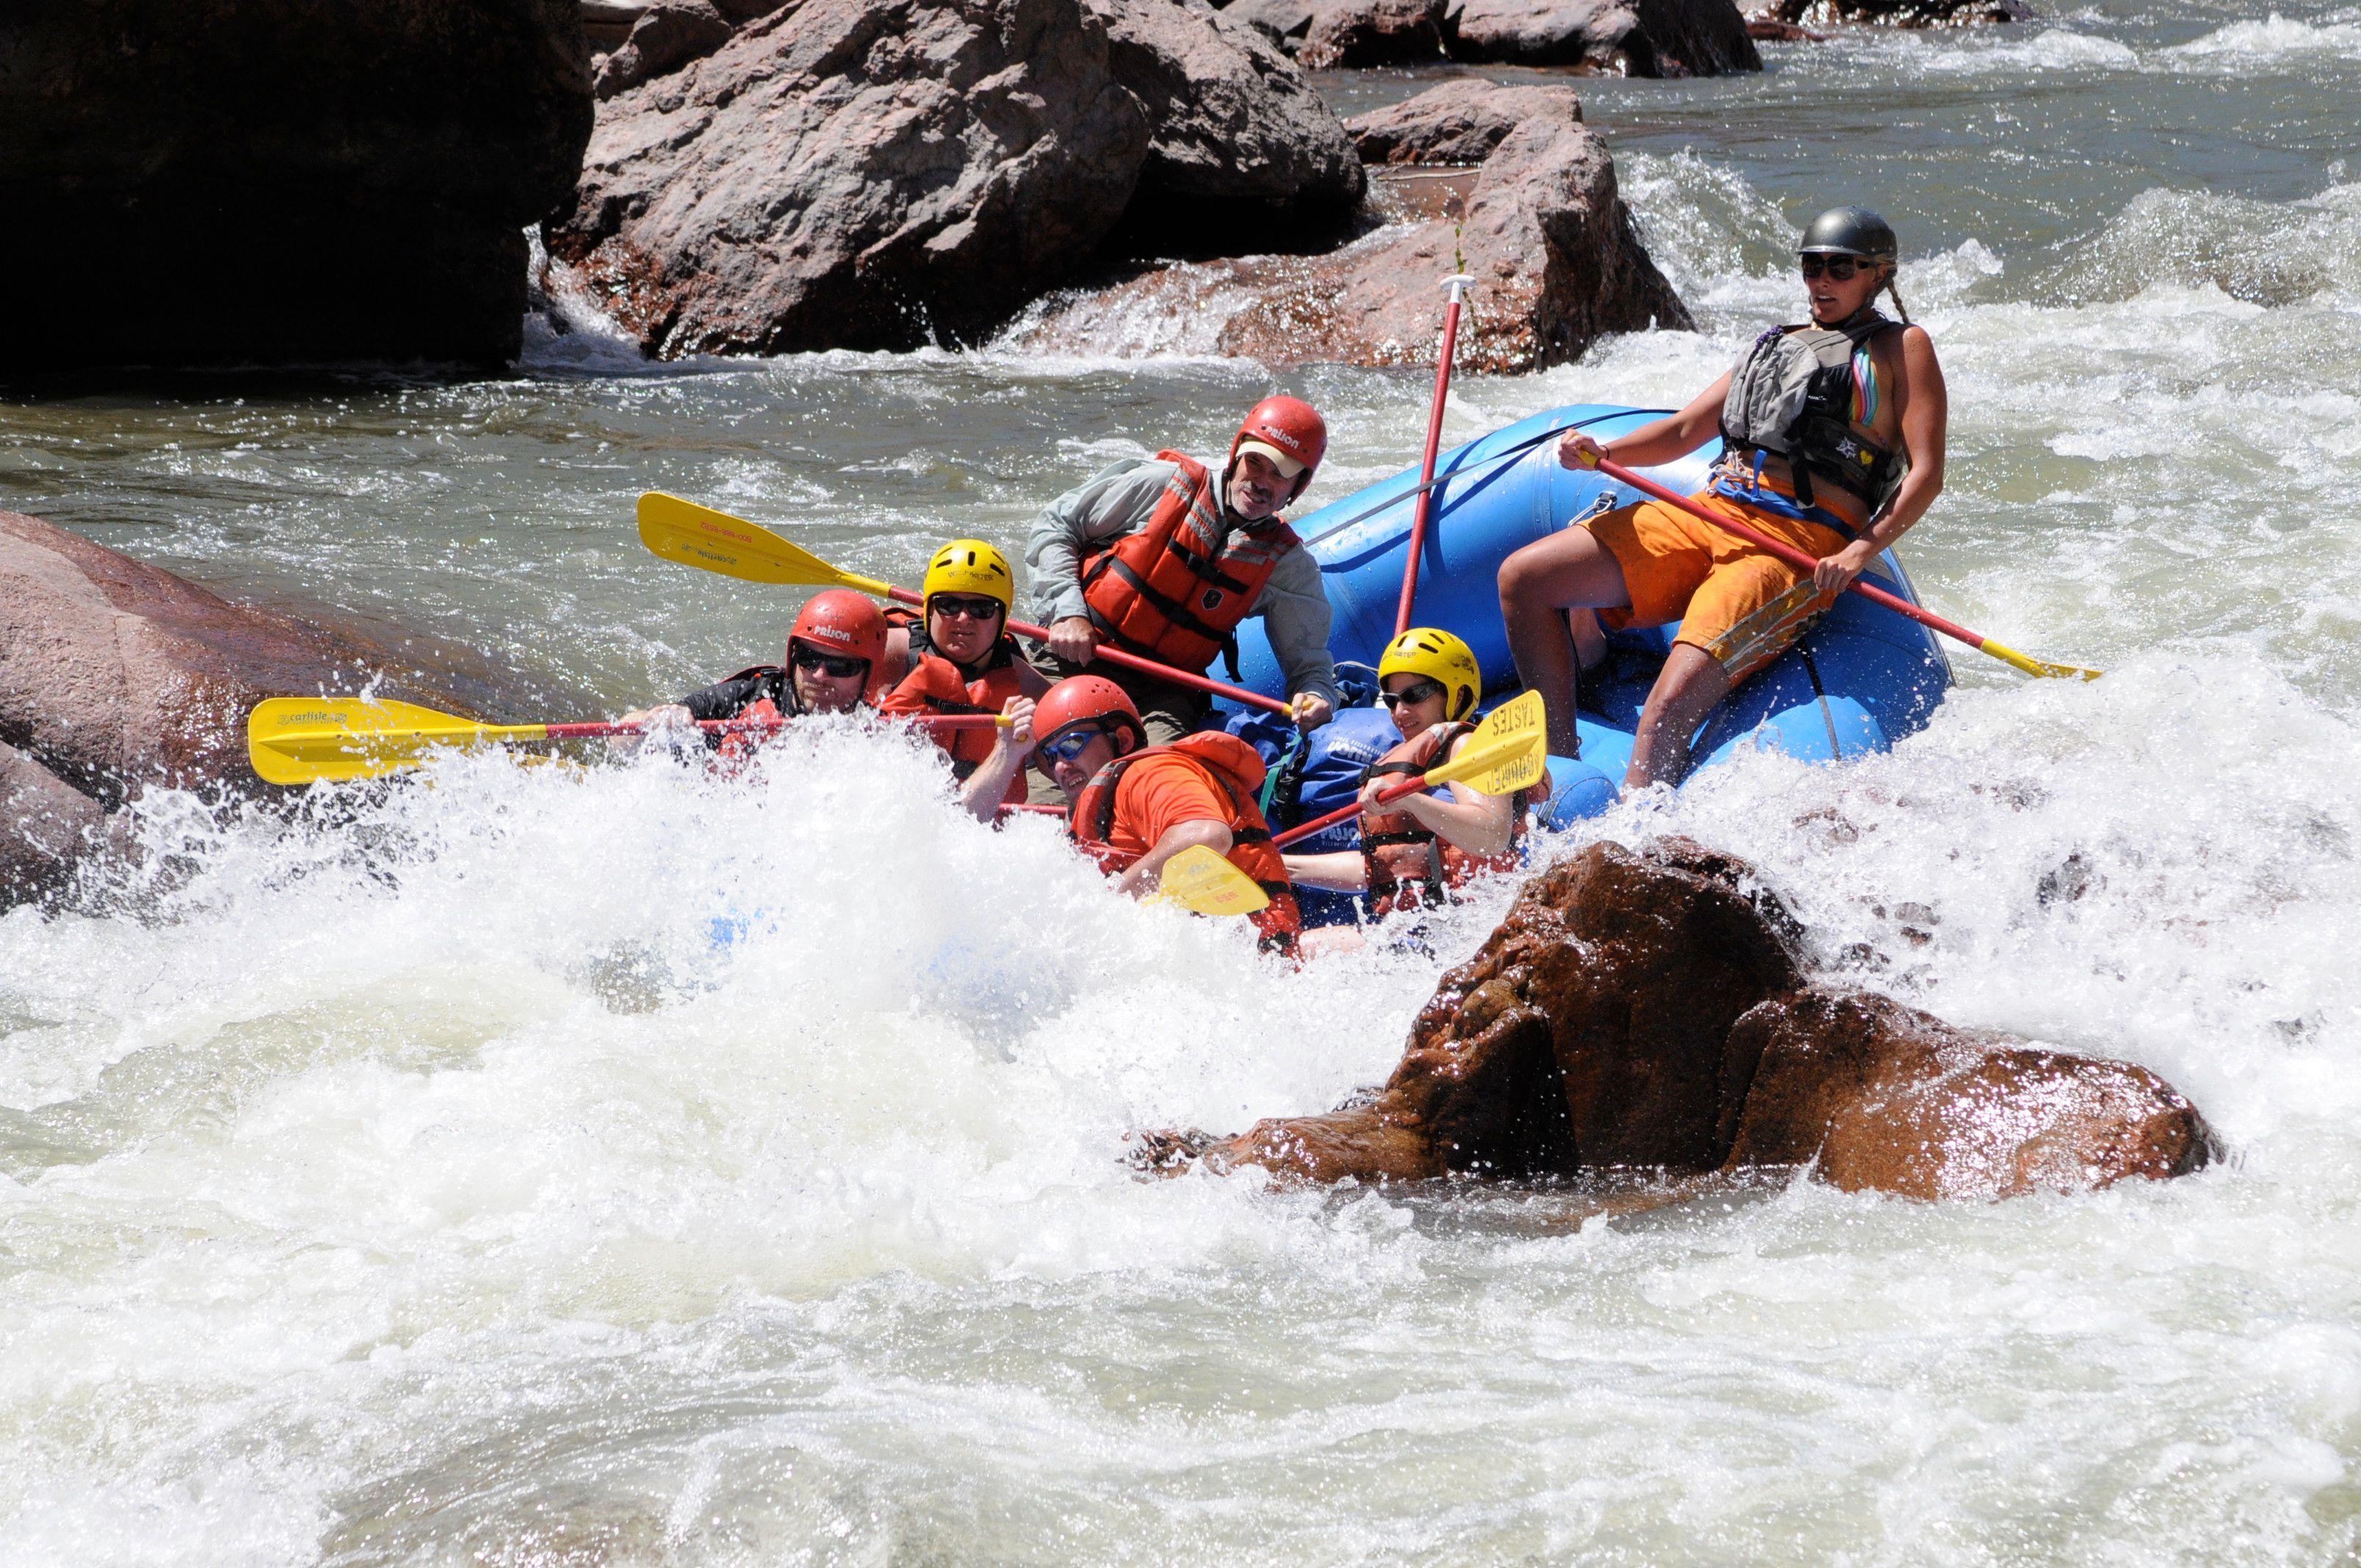 nebraska adventure group omaha ne meetup